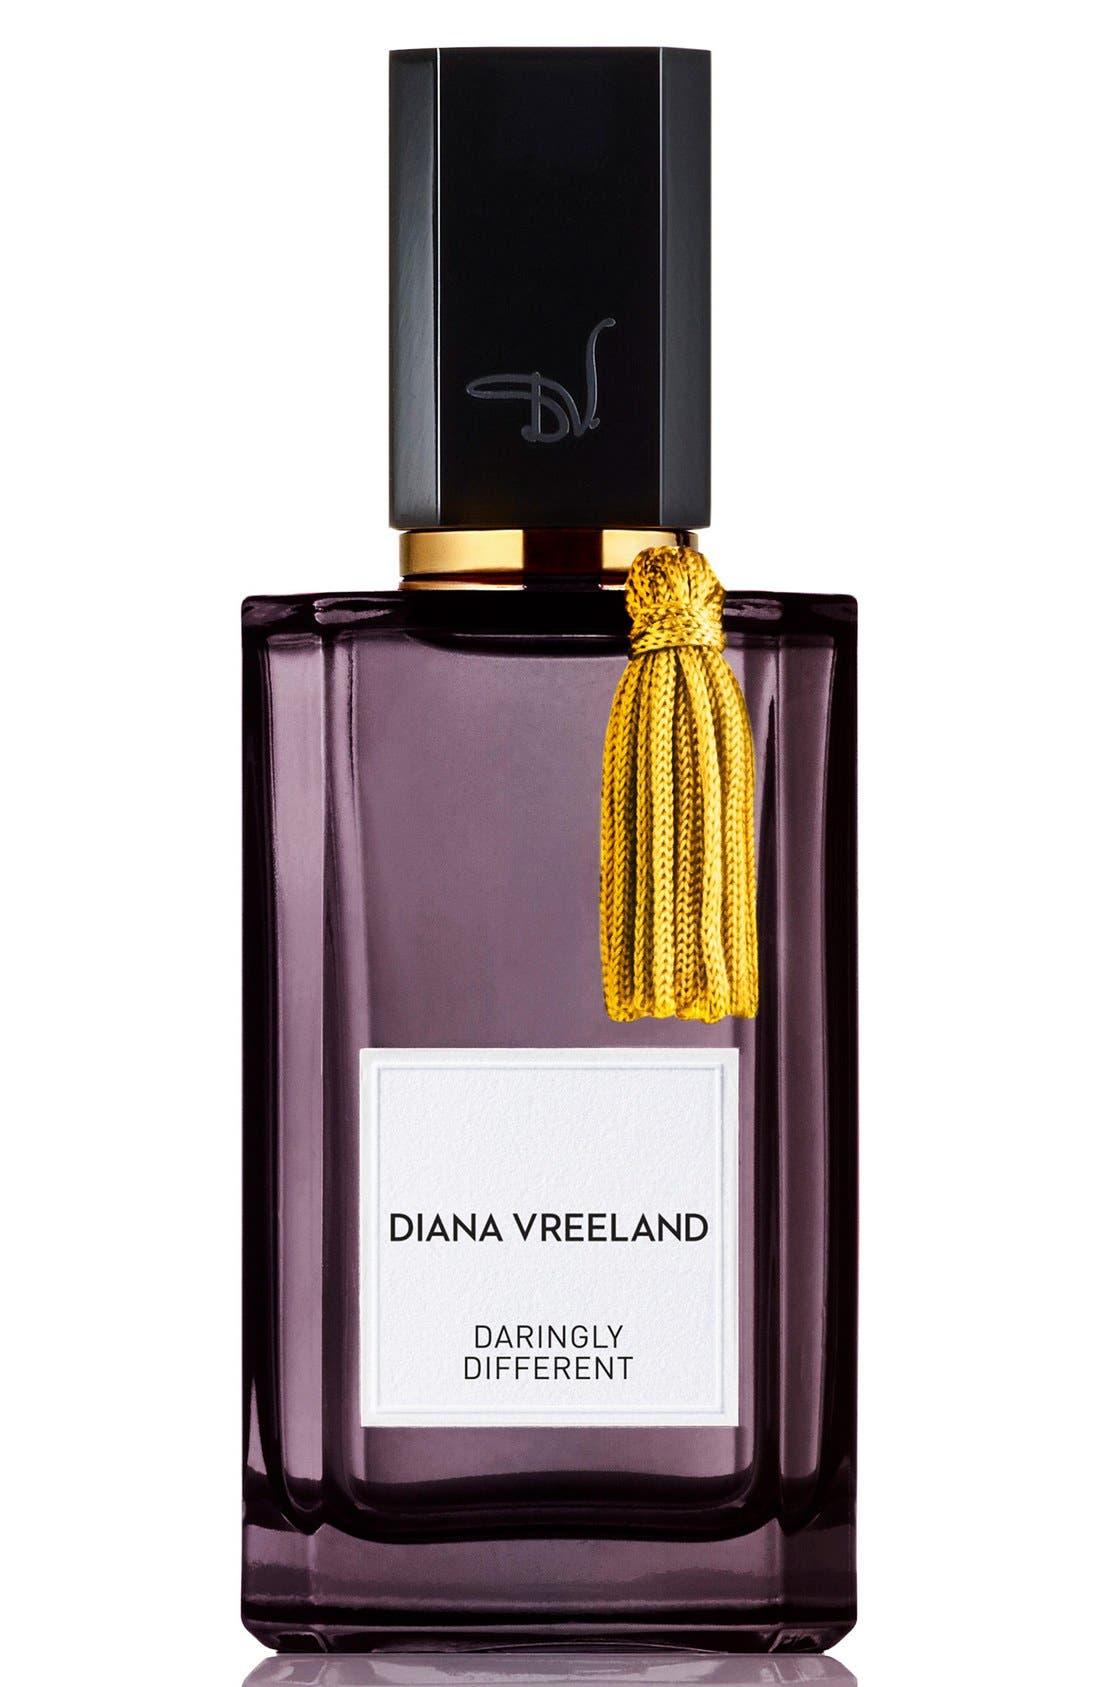 Diana Vreeland 'Daringly Different' Eau de Parfum